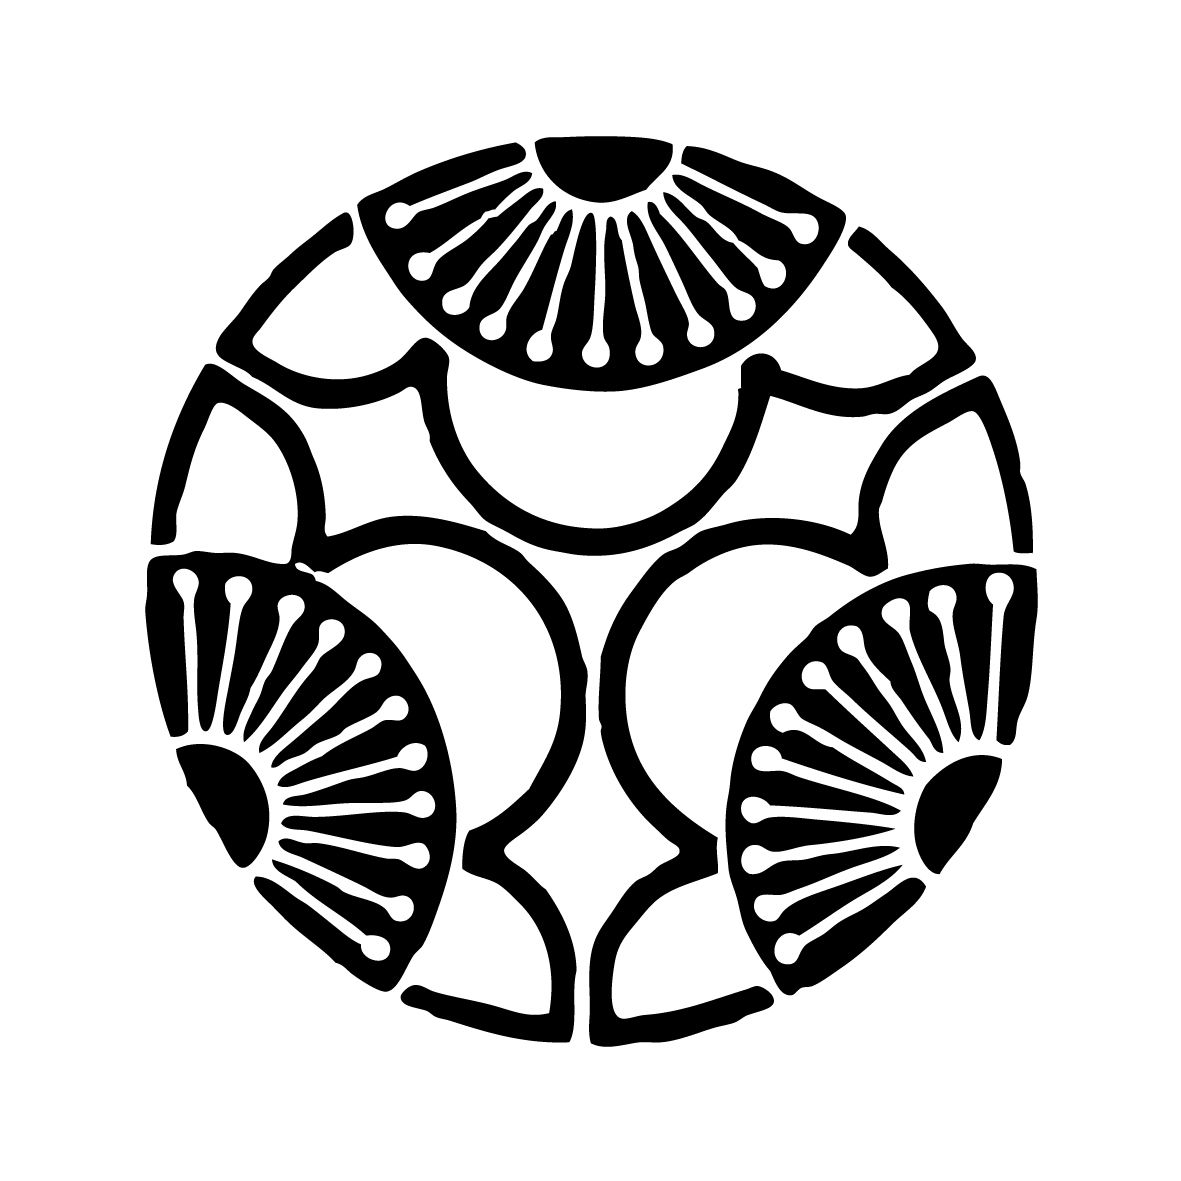 Tattoo Designs Circle: My Favourite Japanese Style Geometric Tattoo Design